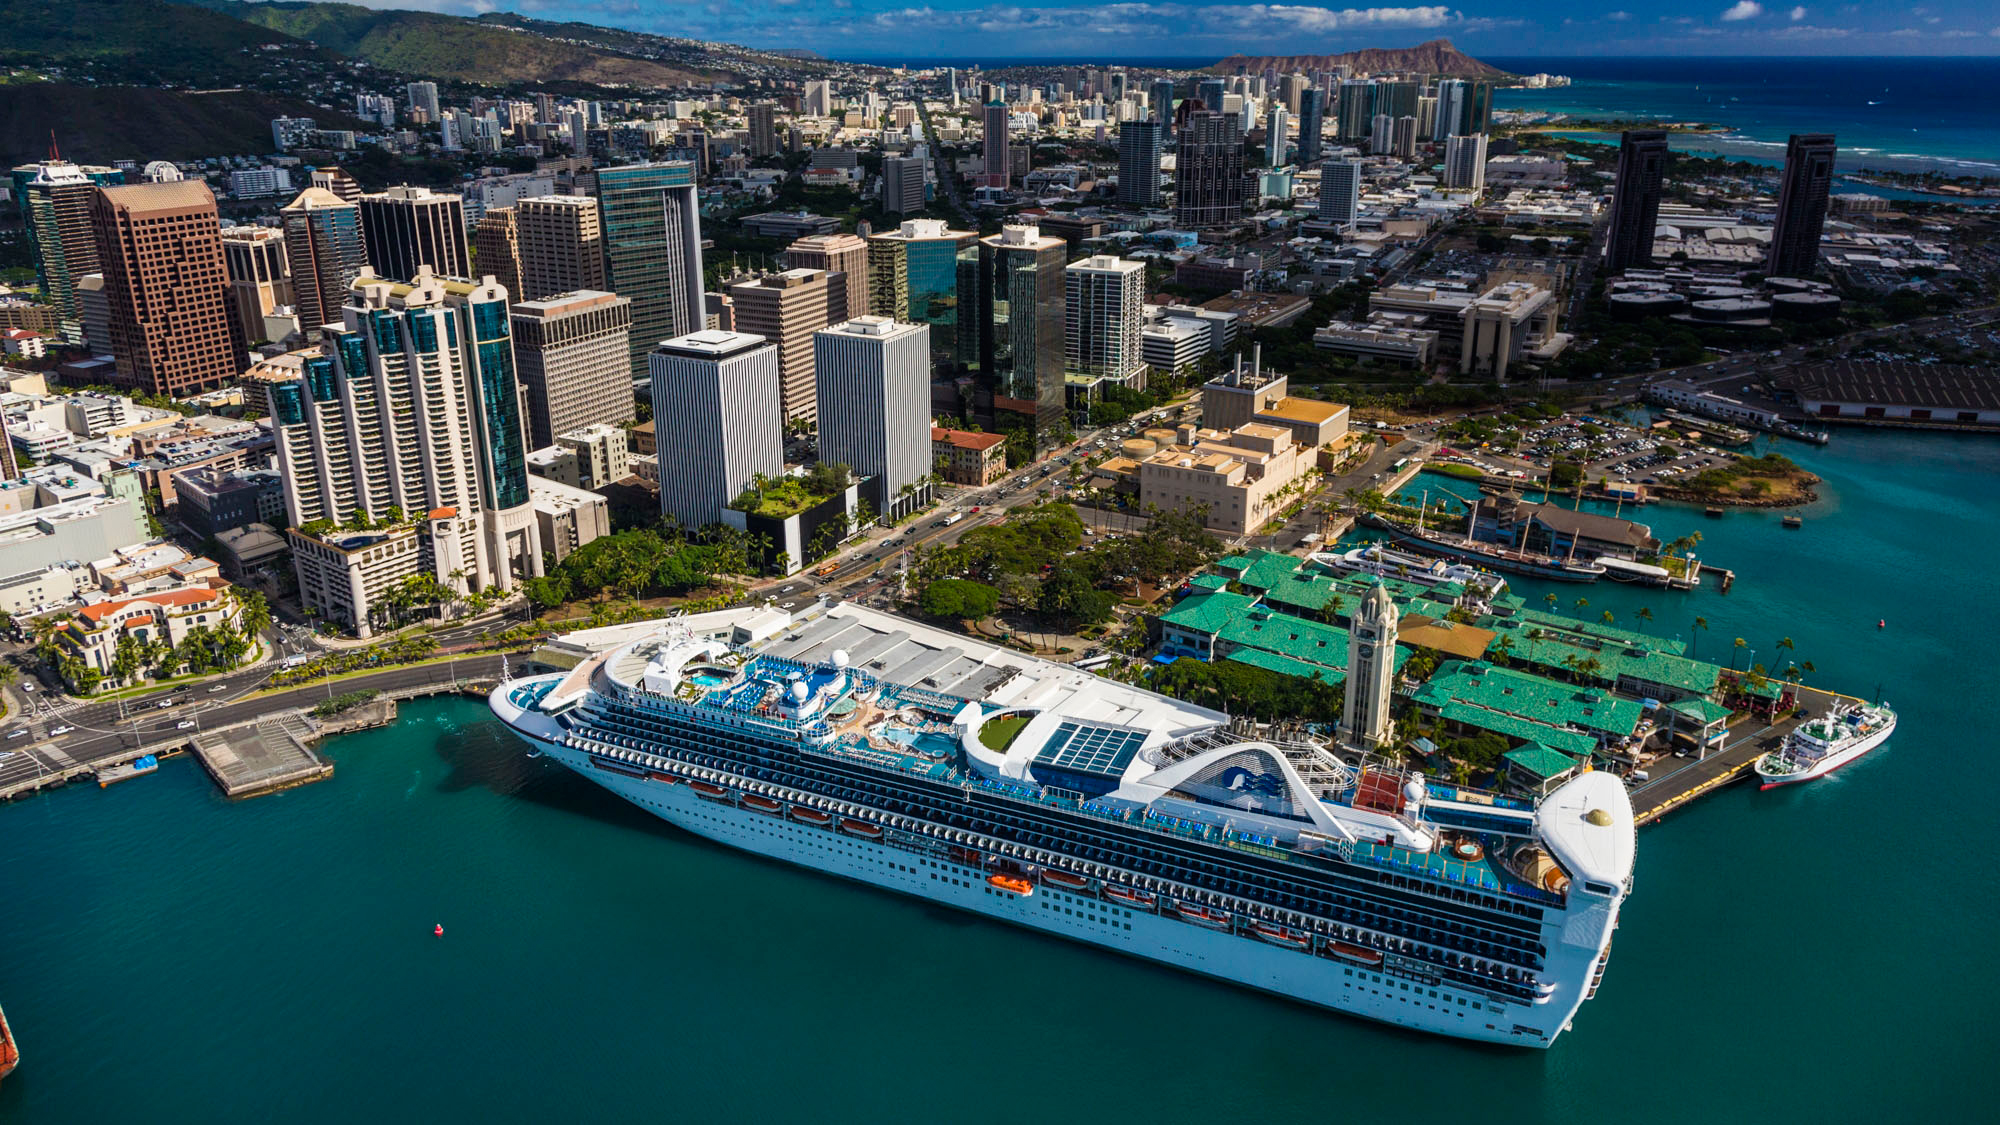 Survey Hawaii The Top Destination For Long Cruises